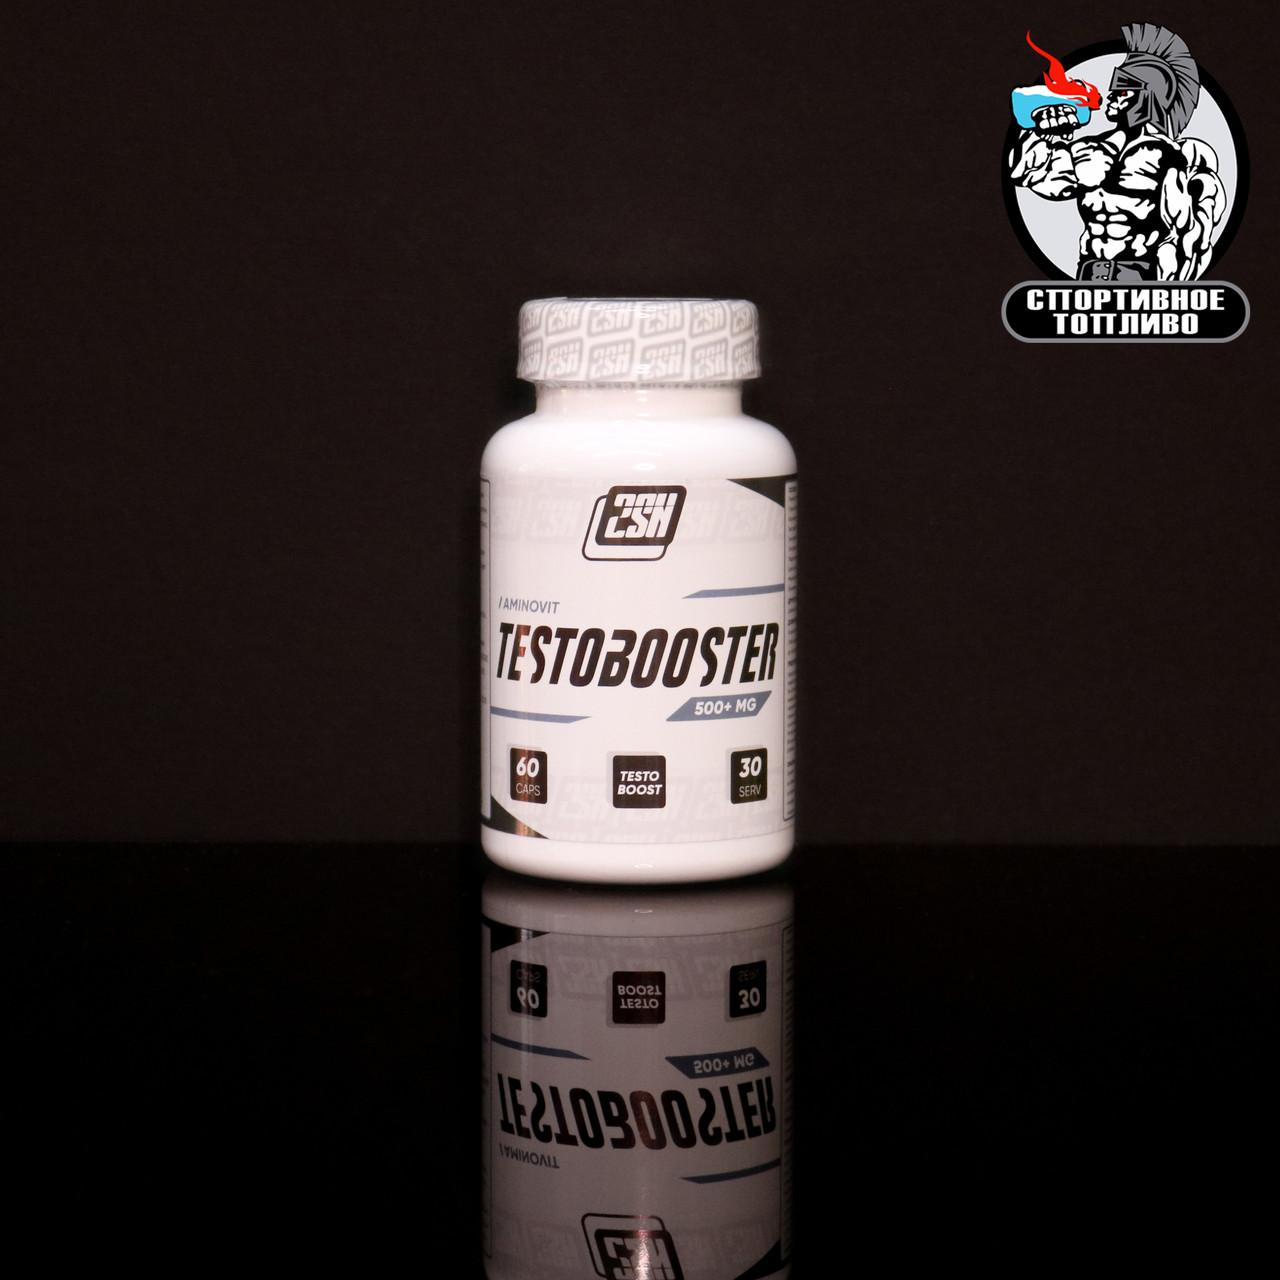 2SN - Testobooster 60капс/30порций